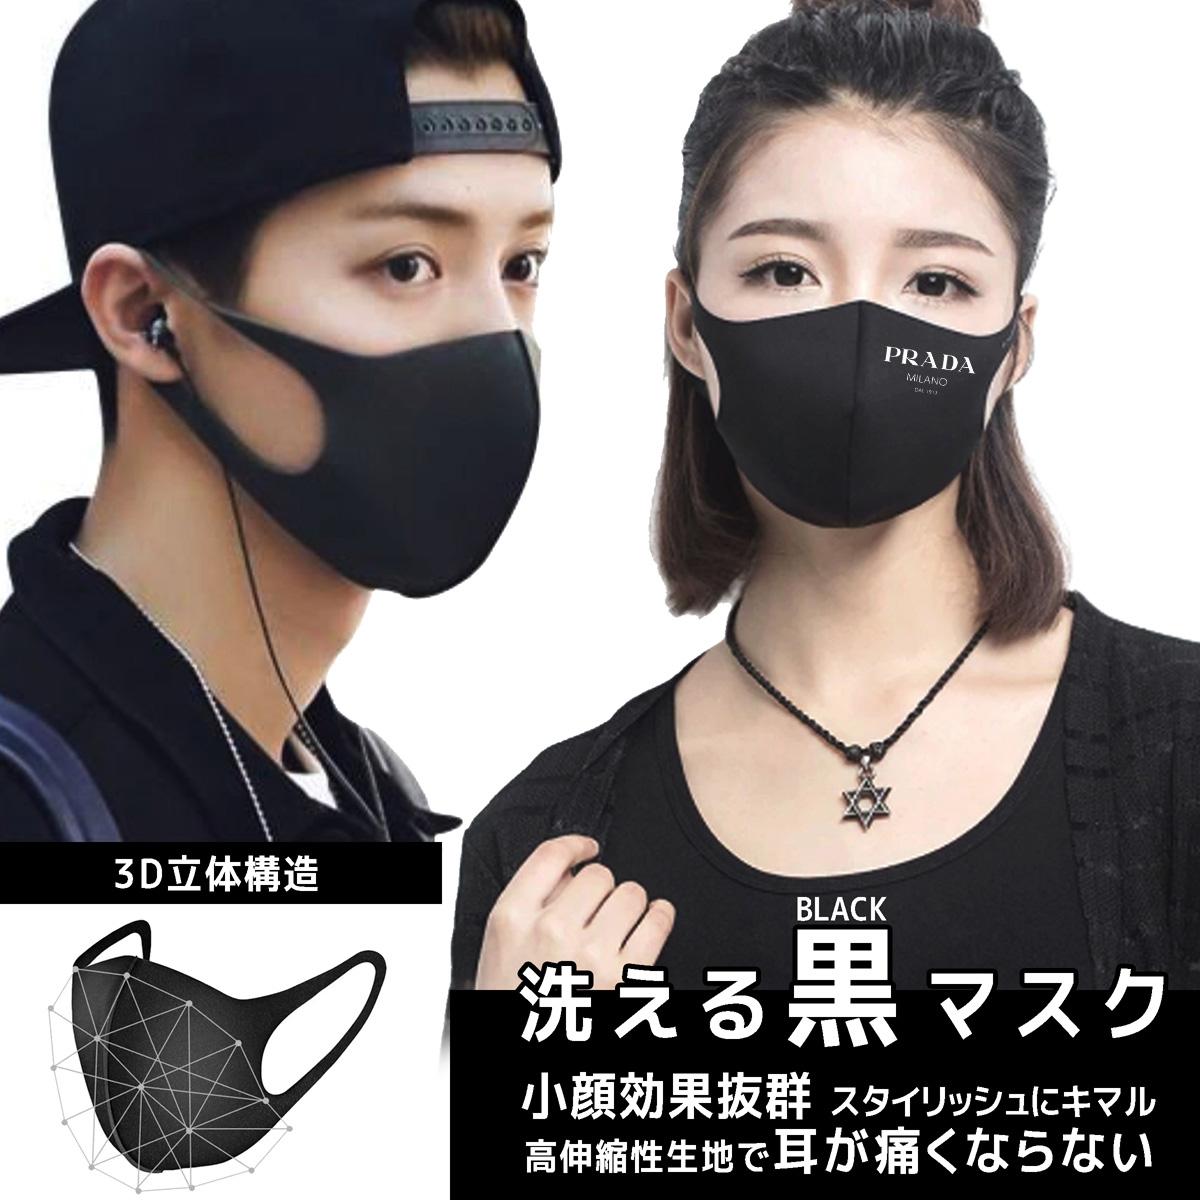 PRADA/プラダ100%綿 マスク大人用 子供用